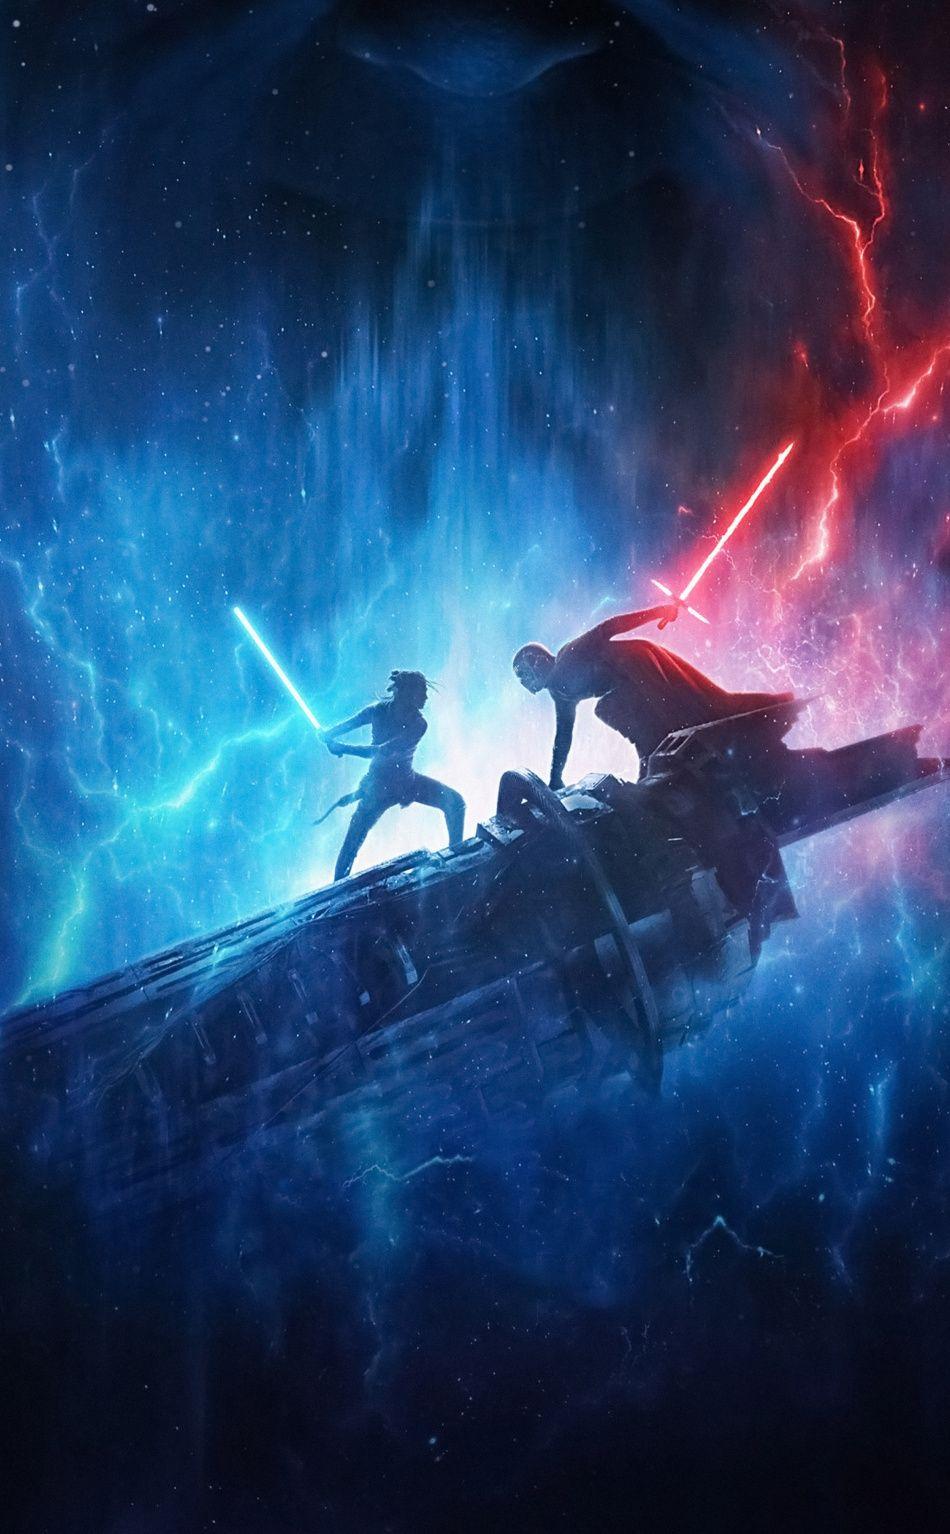 950x1534 Star Wars The Rise Of Skywalker Kylo Ren And Rey 2019 Movie Wallpaper Star Wars Wallpaper Iphone Star Wars Background Star Wars Pictures